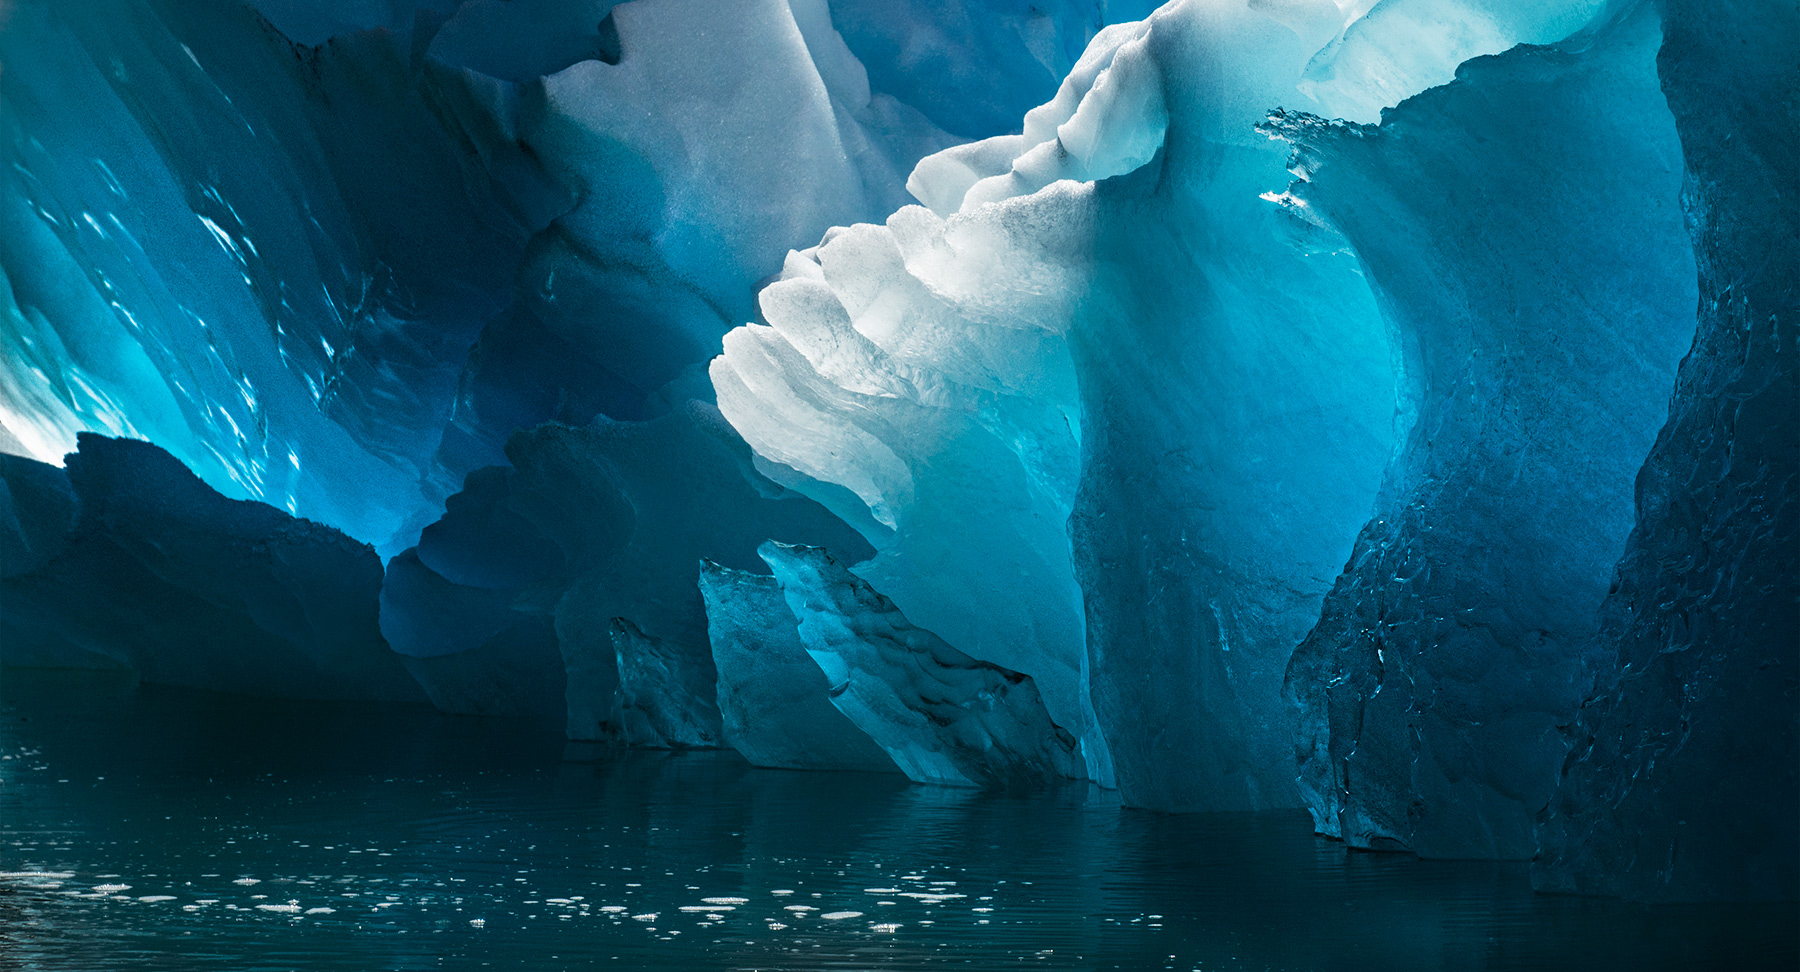 Alaska, iceberg, photo